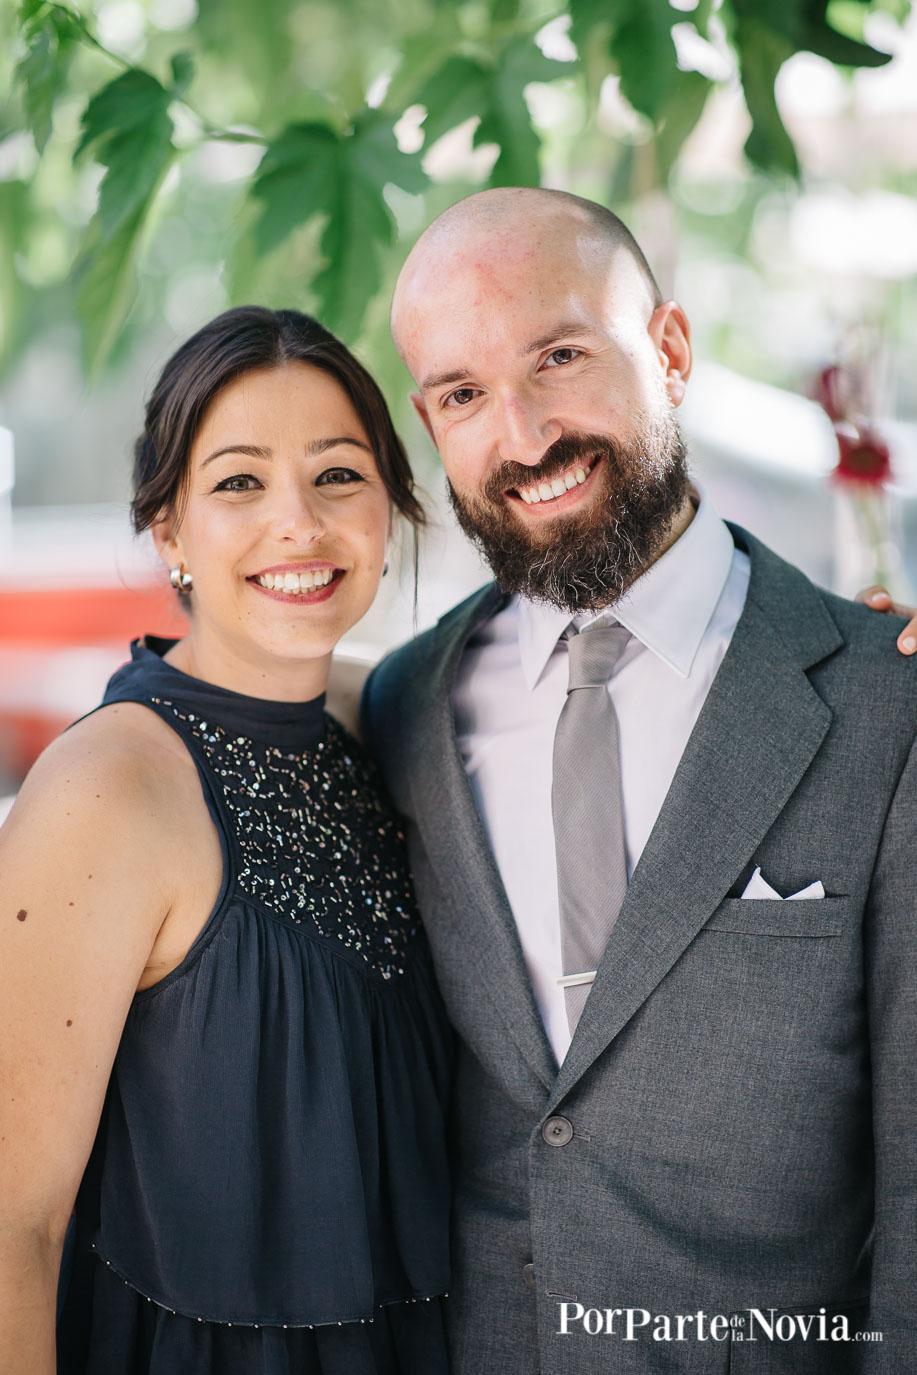 Sara y Sergio Boda 2246 web.jpg